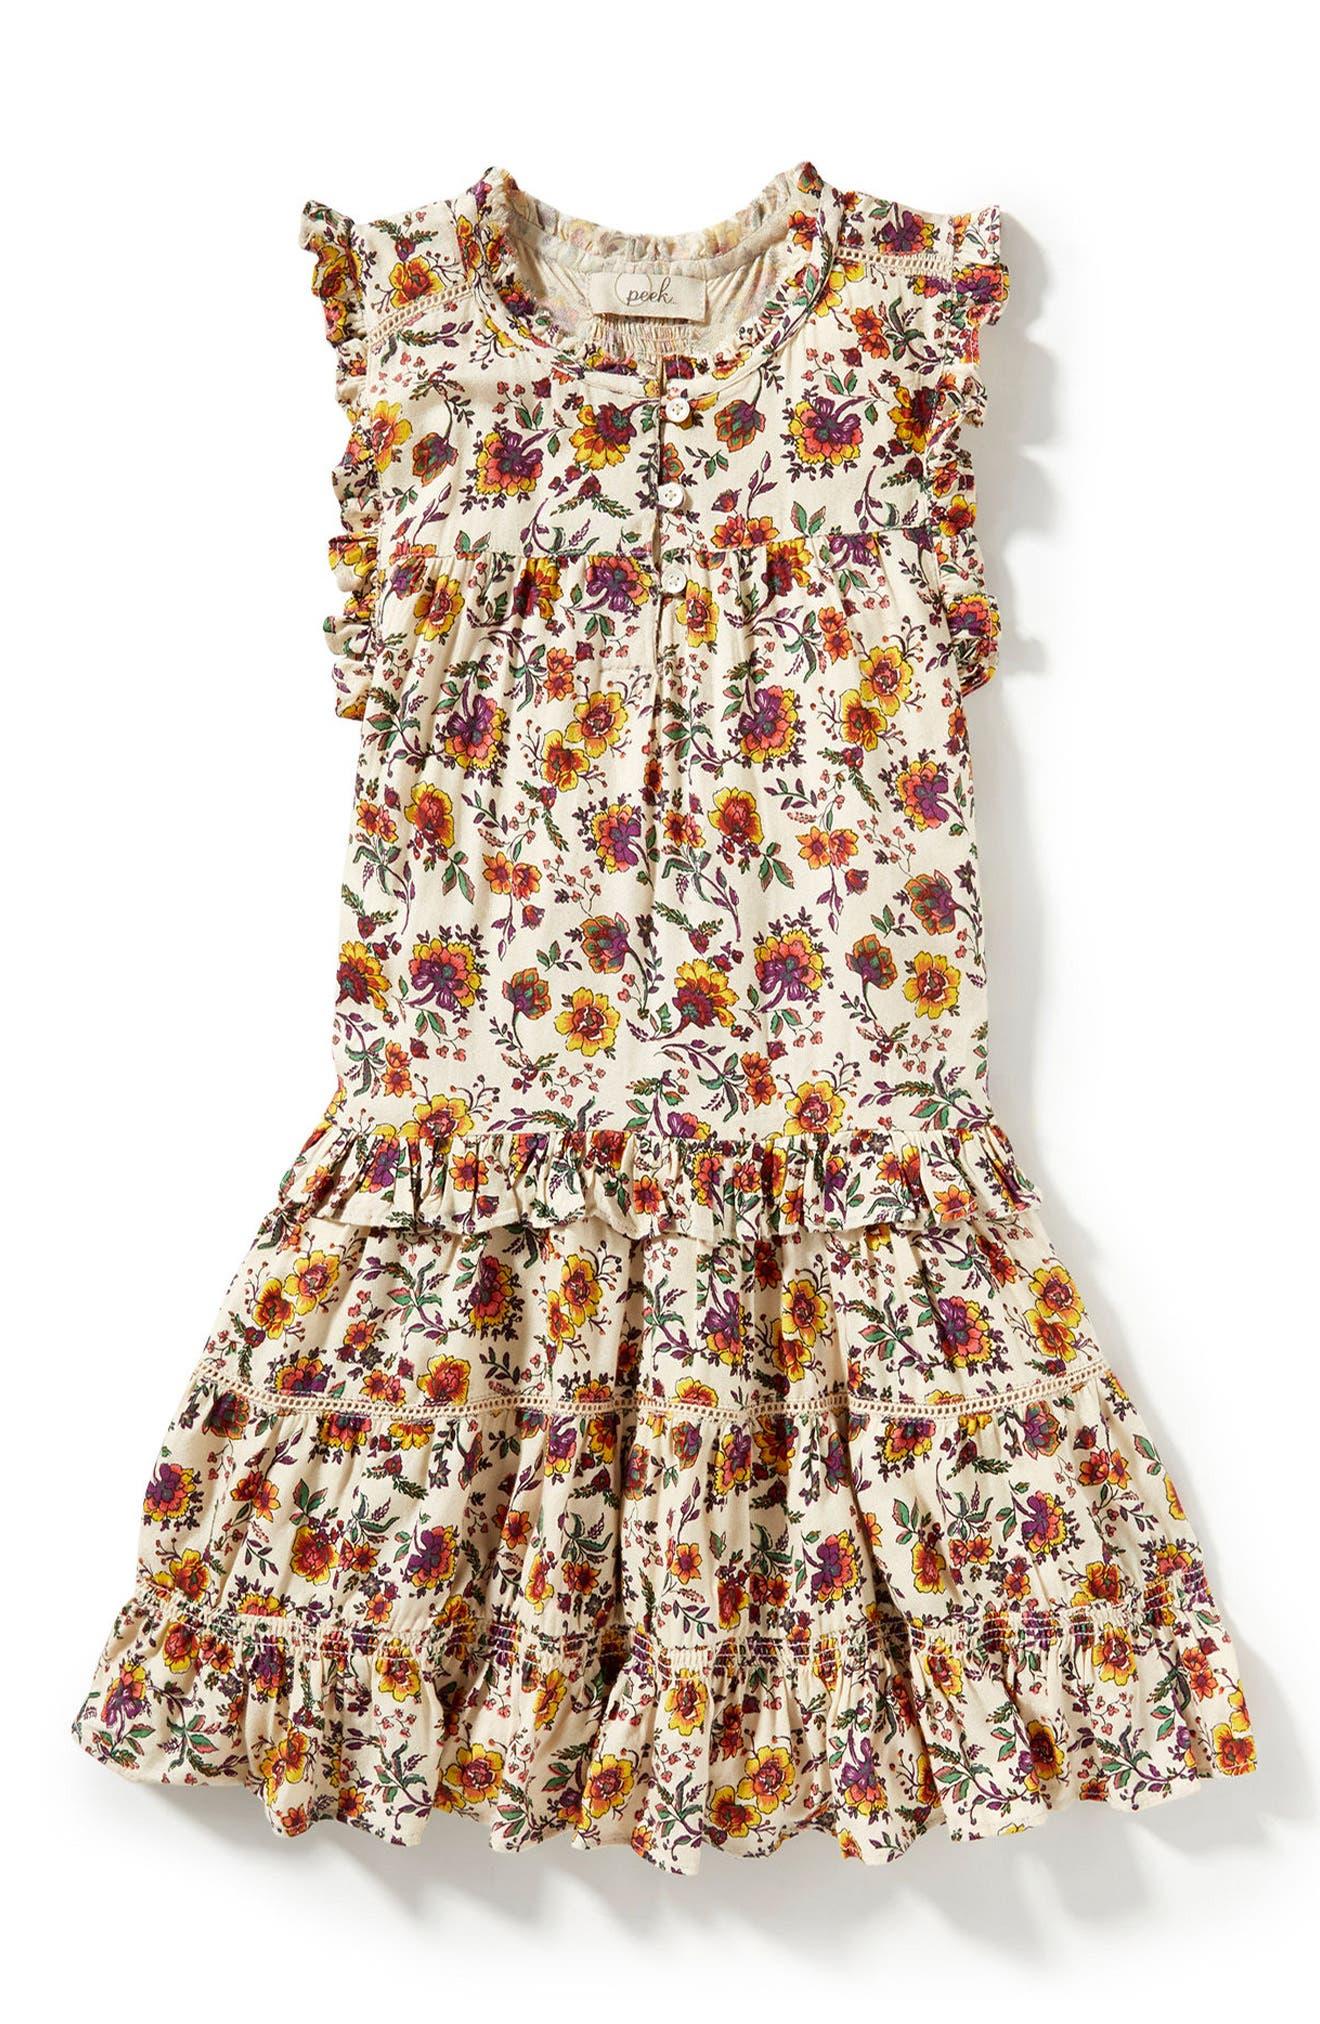 Natalie Print Dress,                             Alternate thumbnail 4, color,                             905